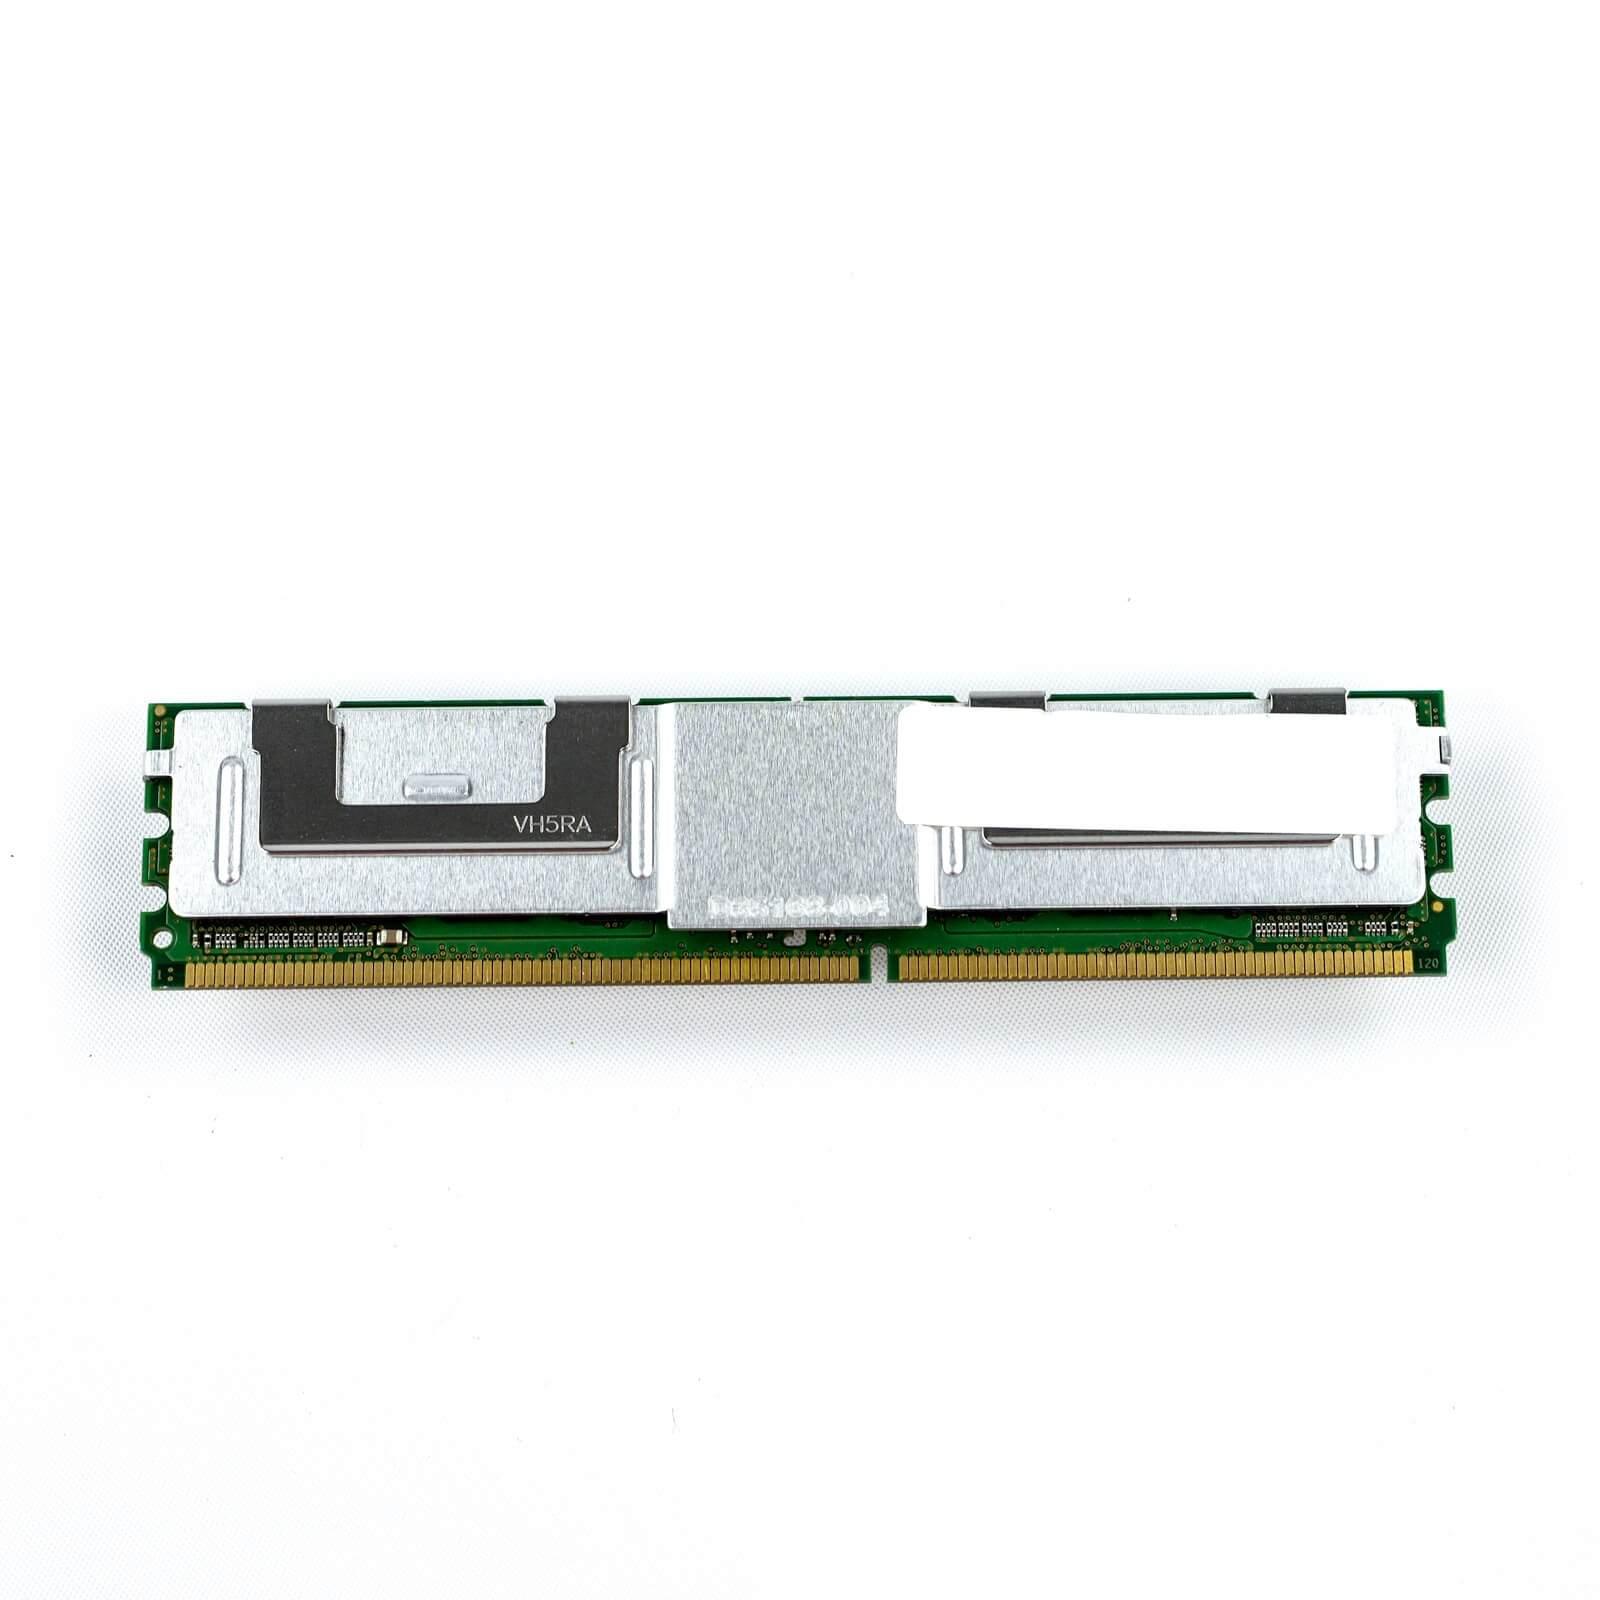 DDR2 2048MB ECC 667MHz